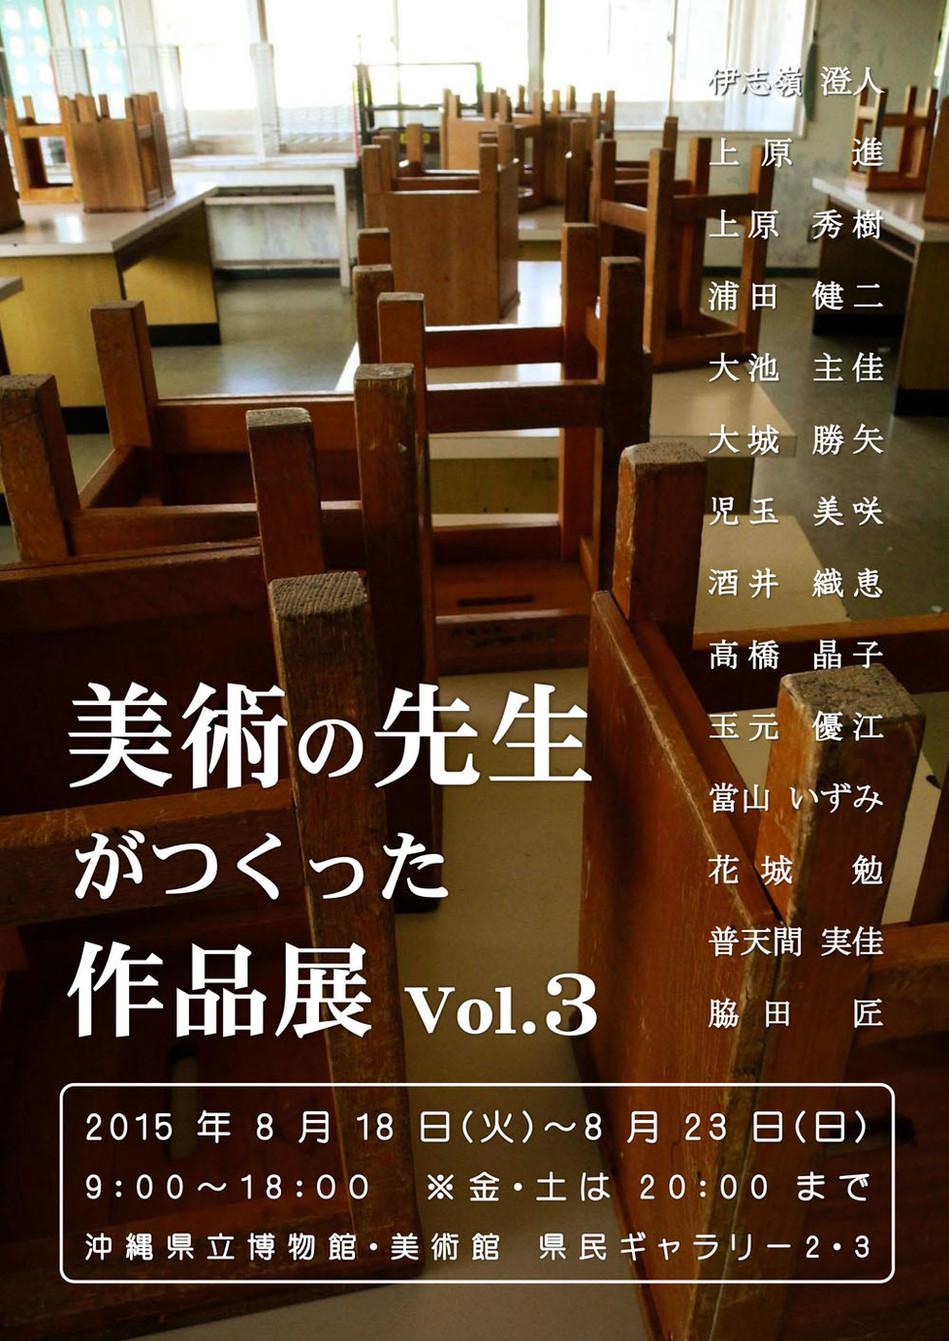 001-vol.3, フライヤー.jpg